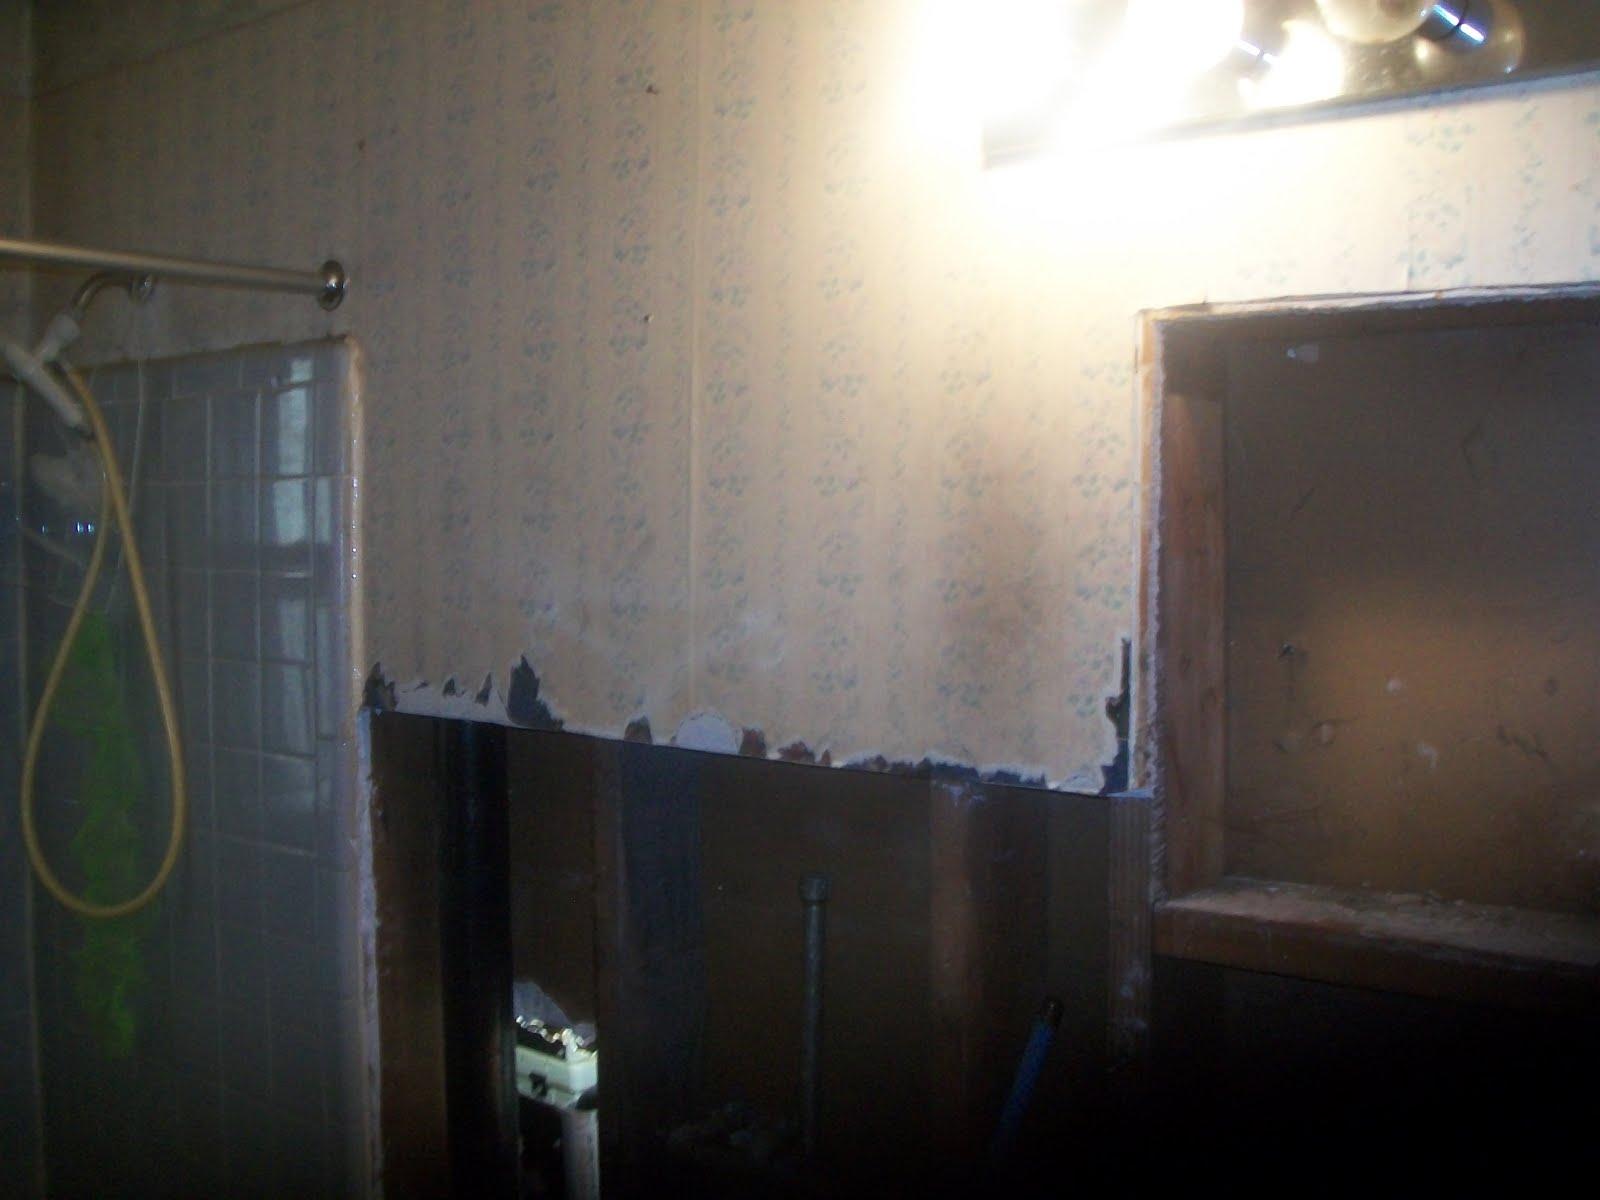 Wallpaper Behind Toilet | New hd wallon